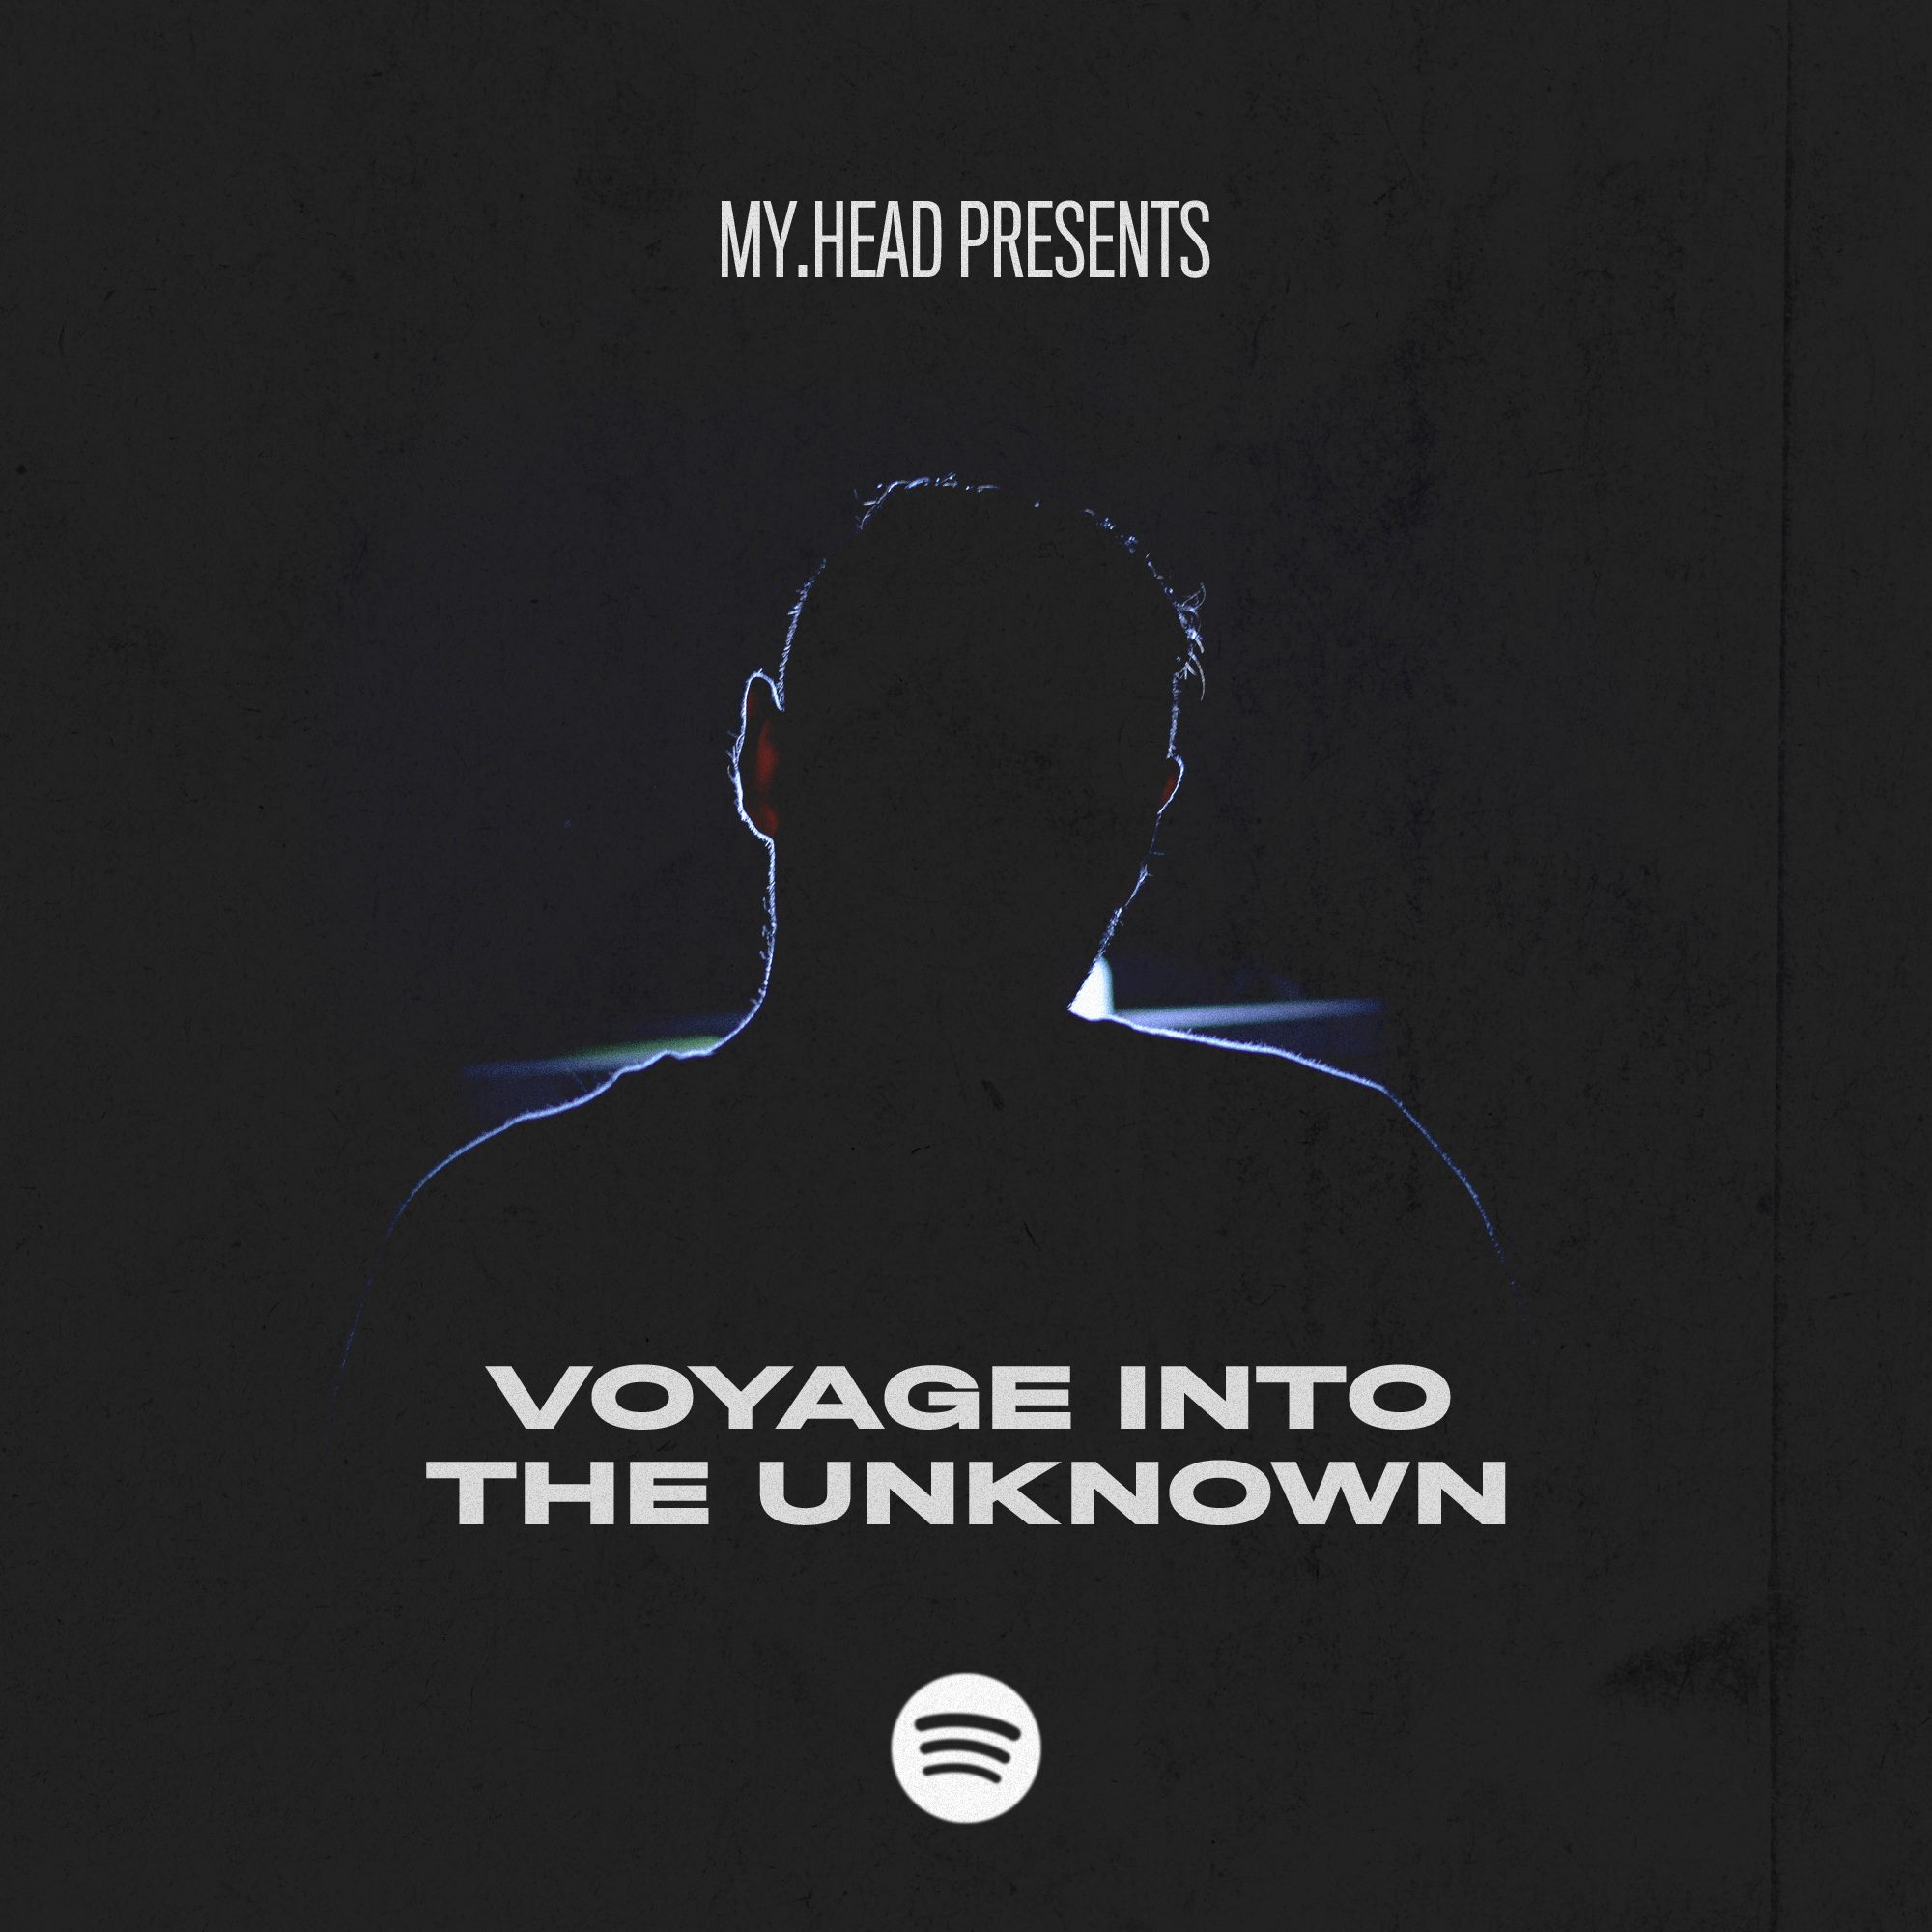 myhead_voyageintotheunknown.jpg